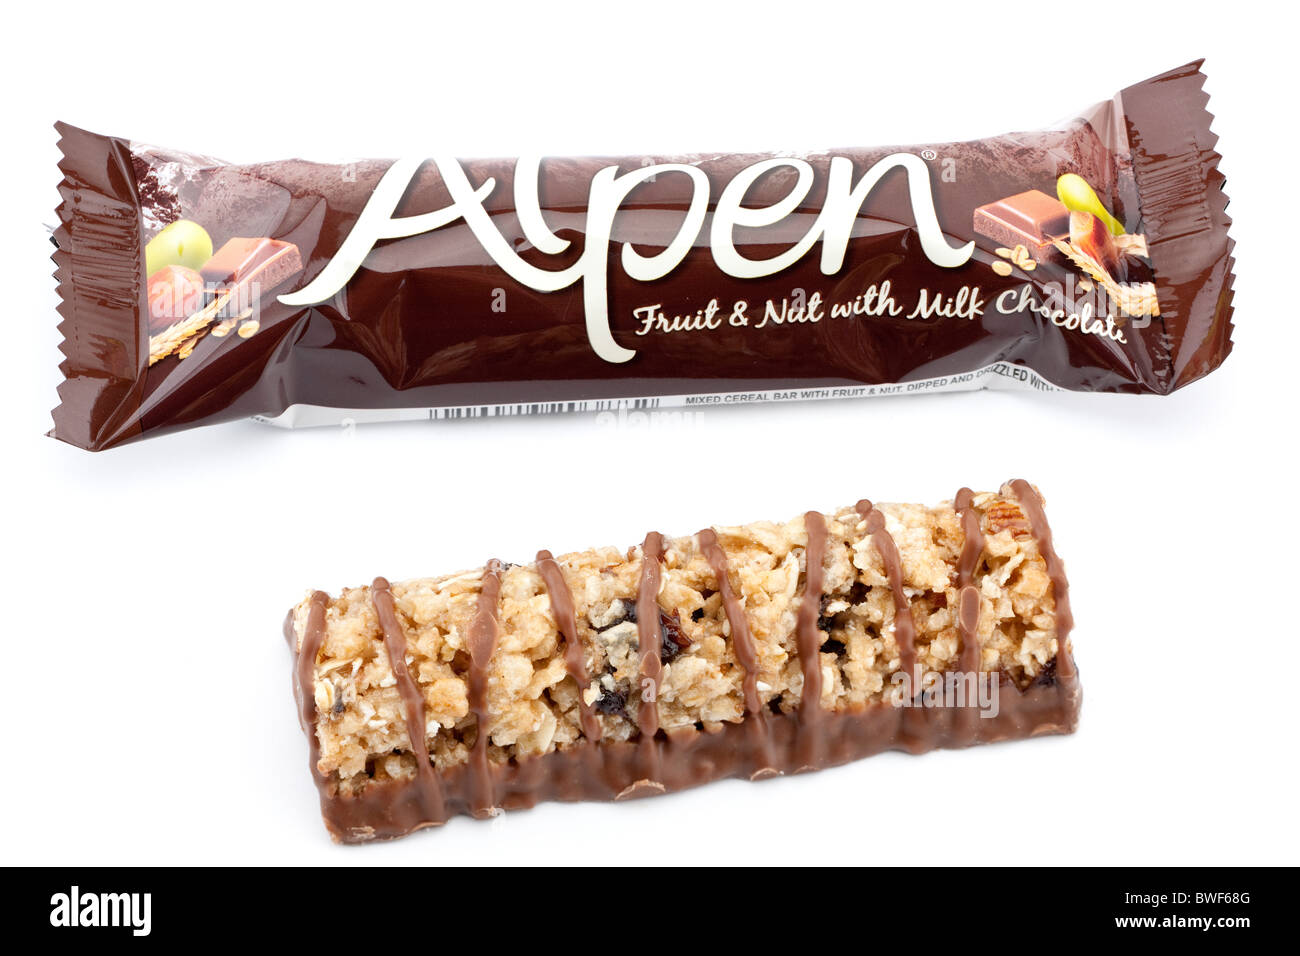 Alpen fruit and nut chocolate bar - Stock Image